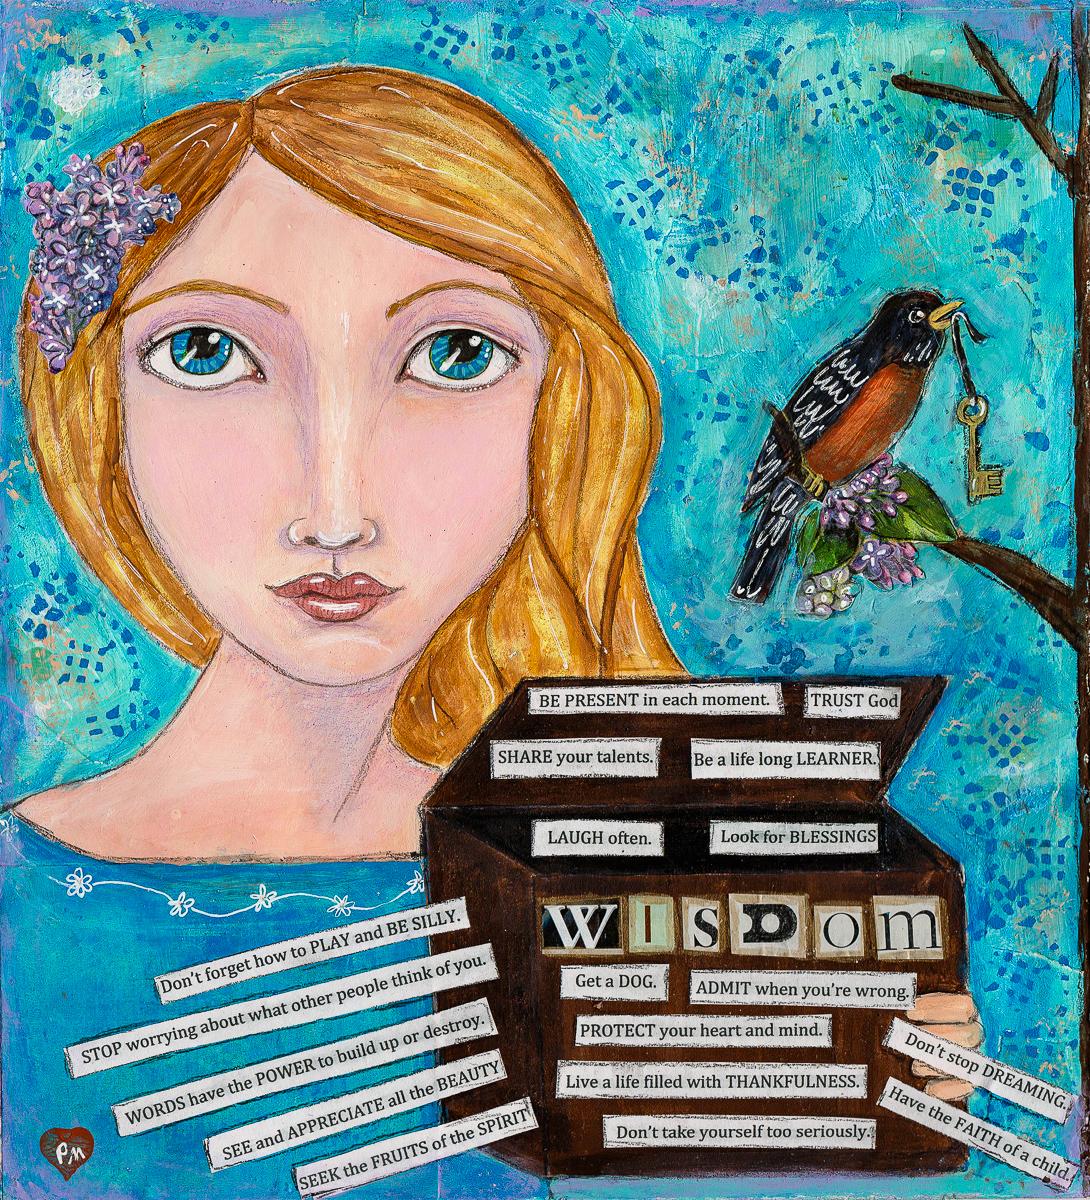 Wisdom Girl